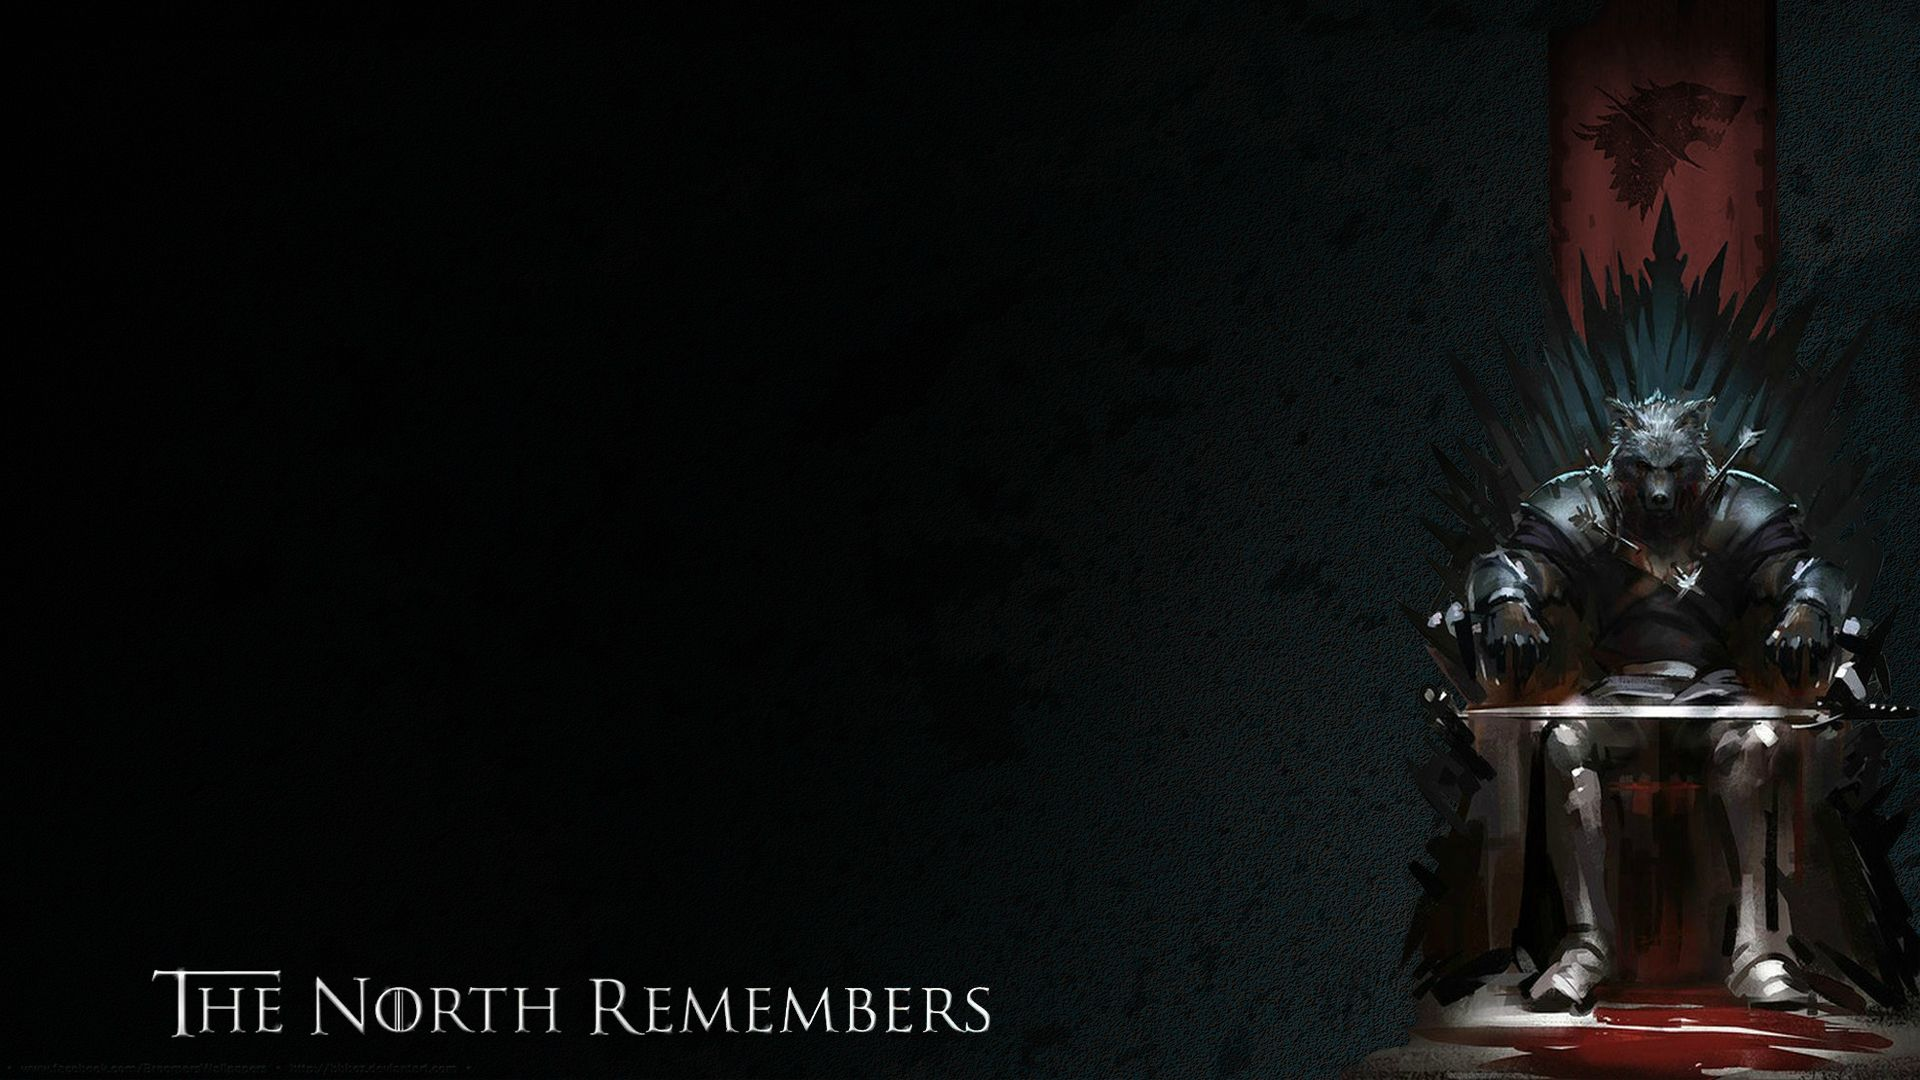 Download The North Remembers   Game of Thrones desktop Wallpaper 1920x1080